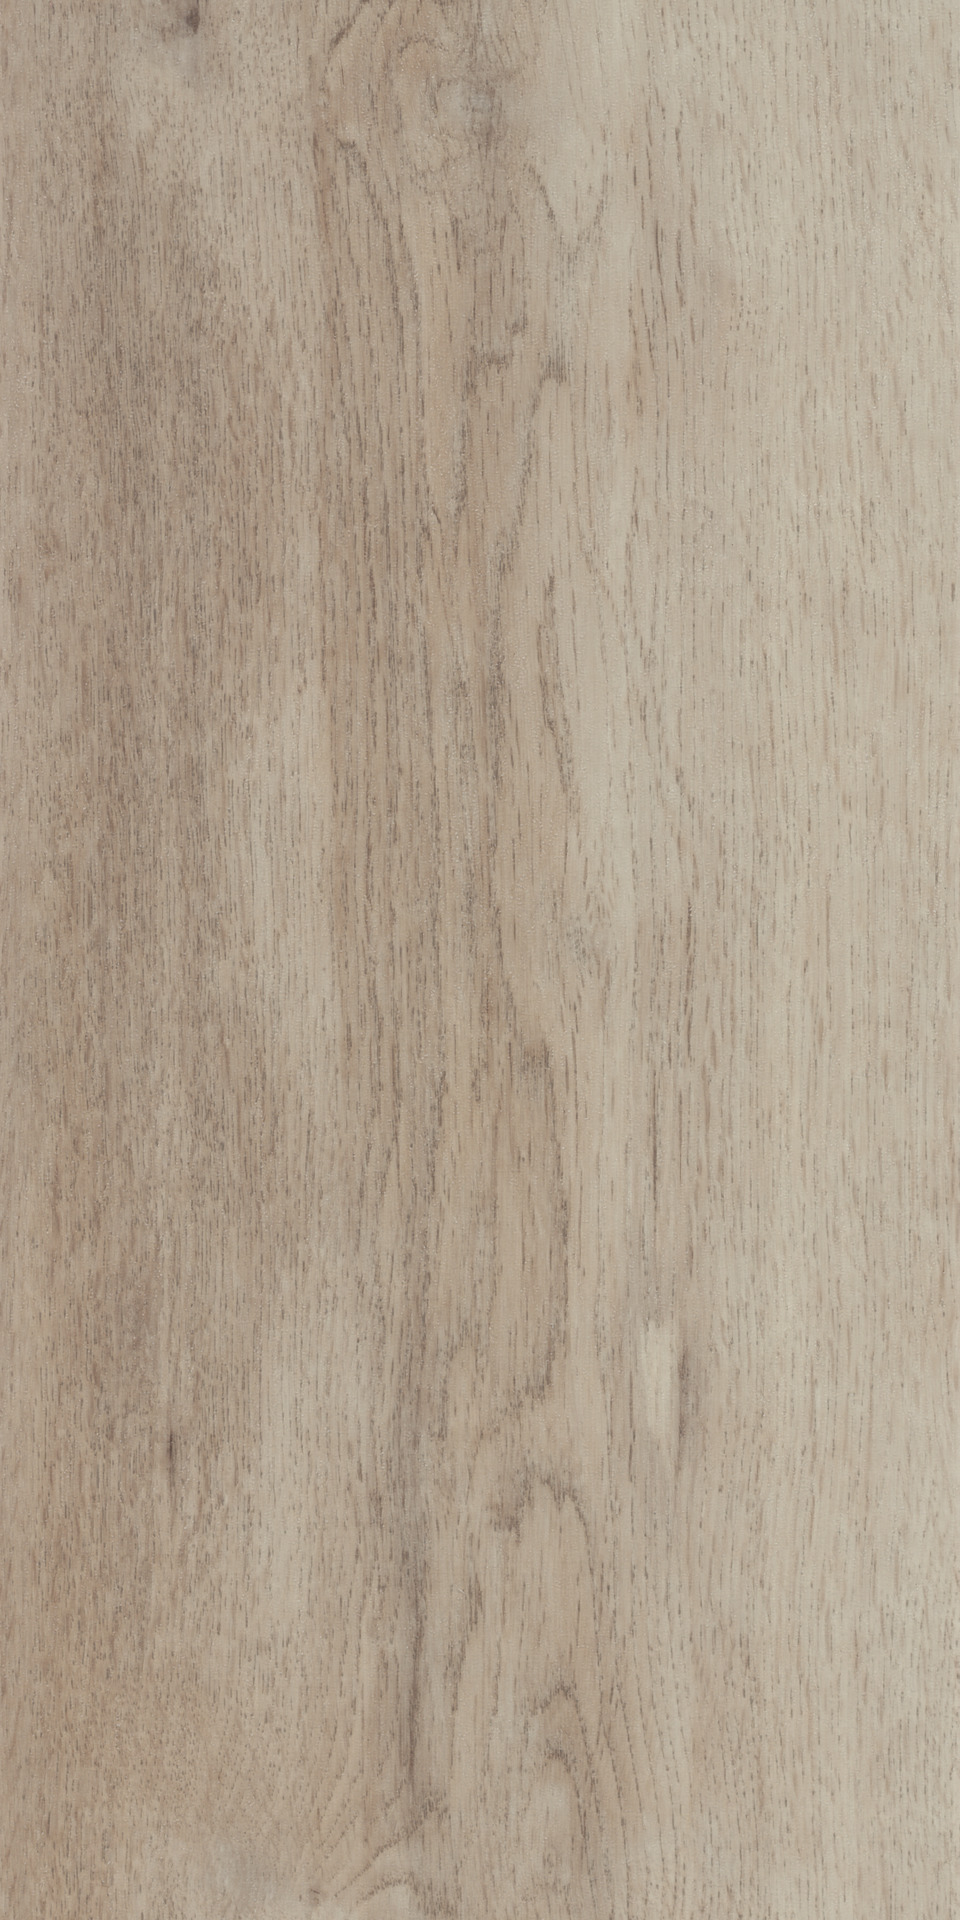 loose lay vinylboden kaufen bodenheld24. Black Bedroom Furniture Sets. Home Design Ideas